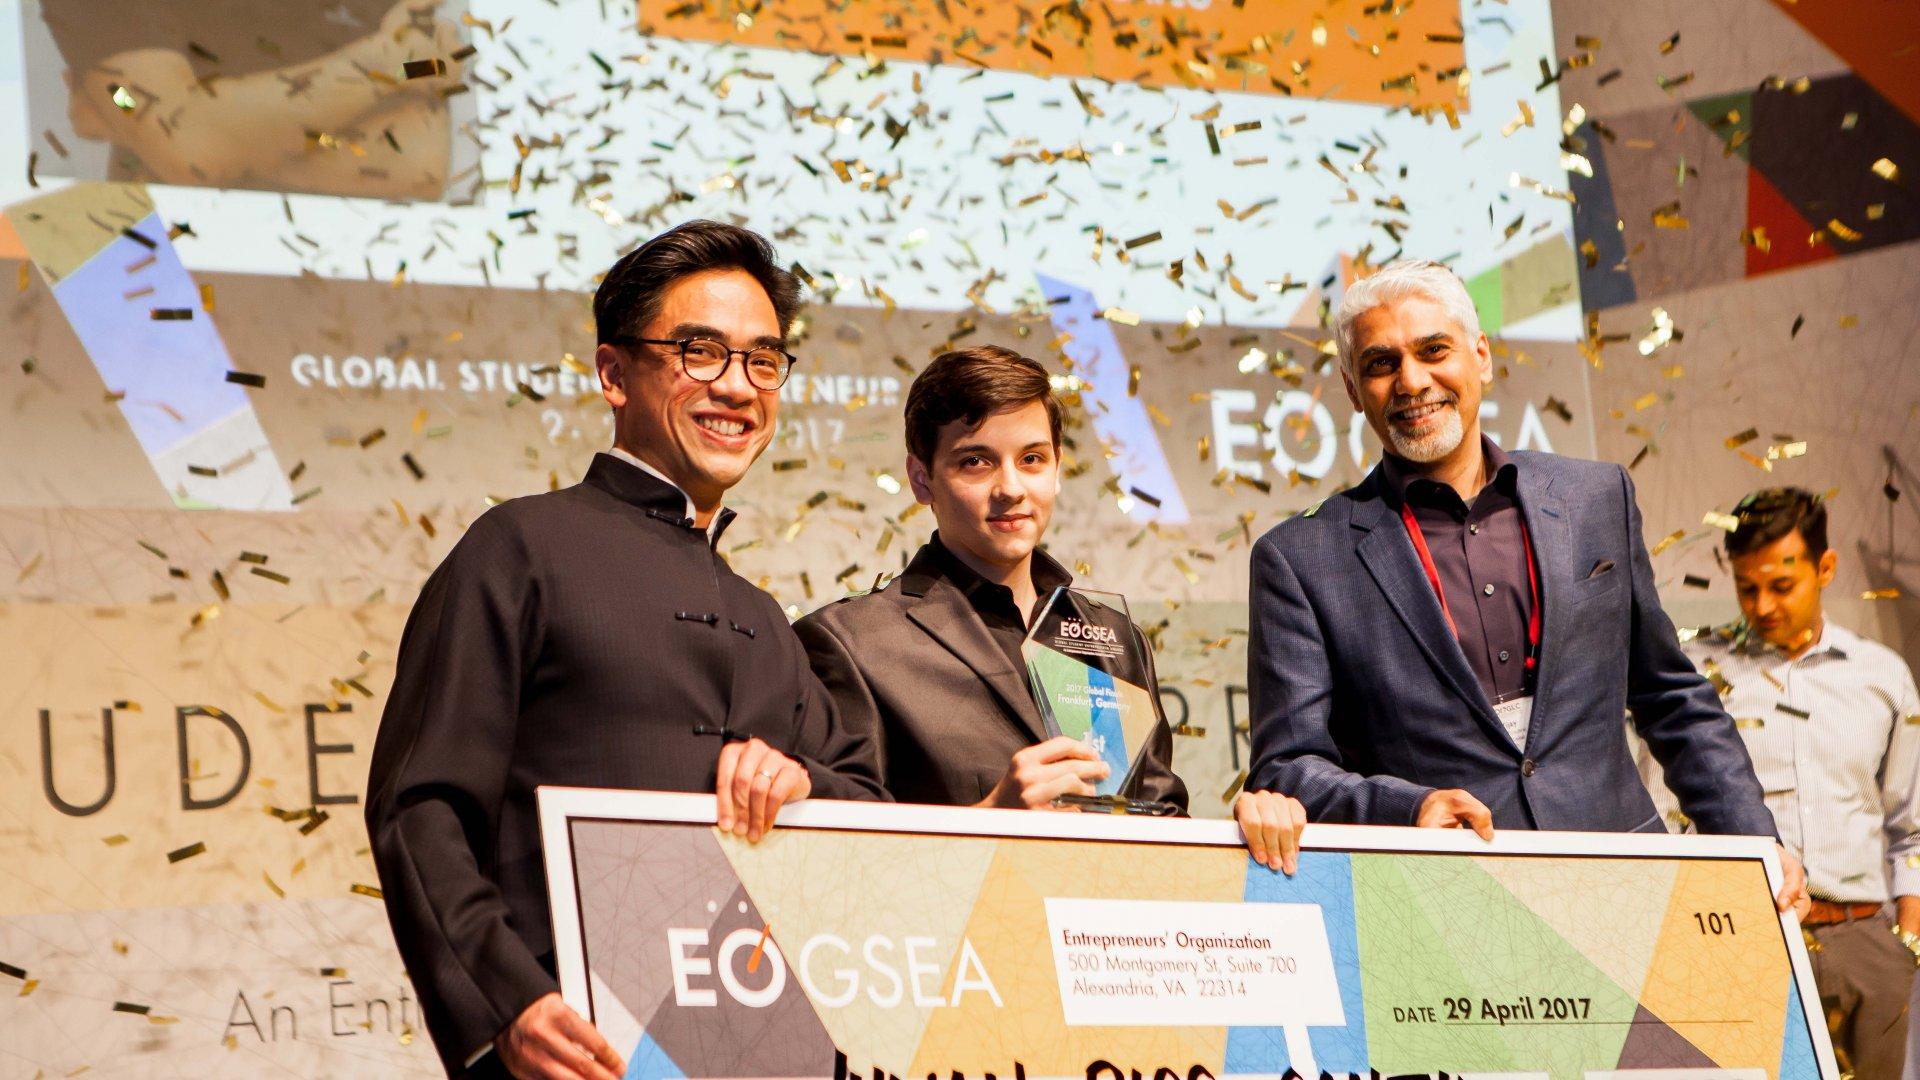 <b>The 2017 Global Student Entrepreneur of the Year is Revolutionizing Women's Health</b>